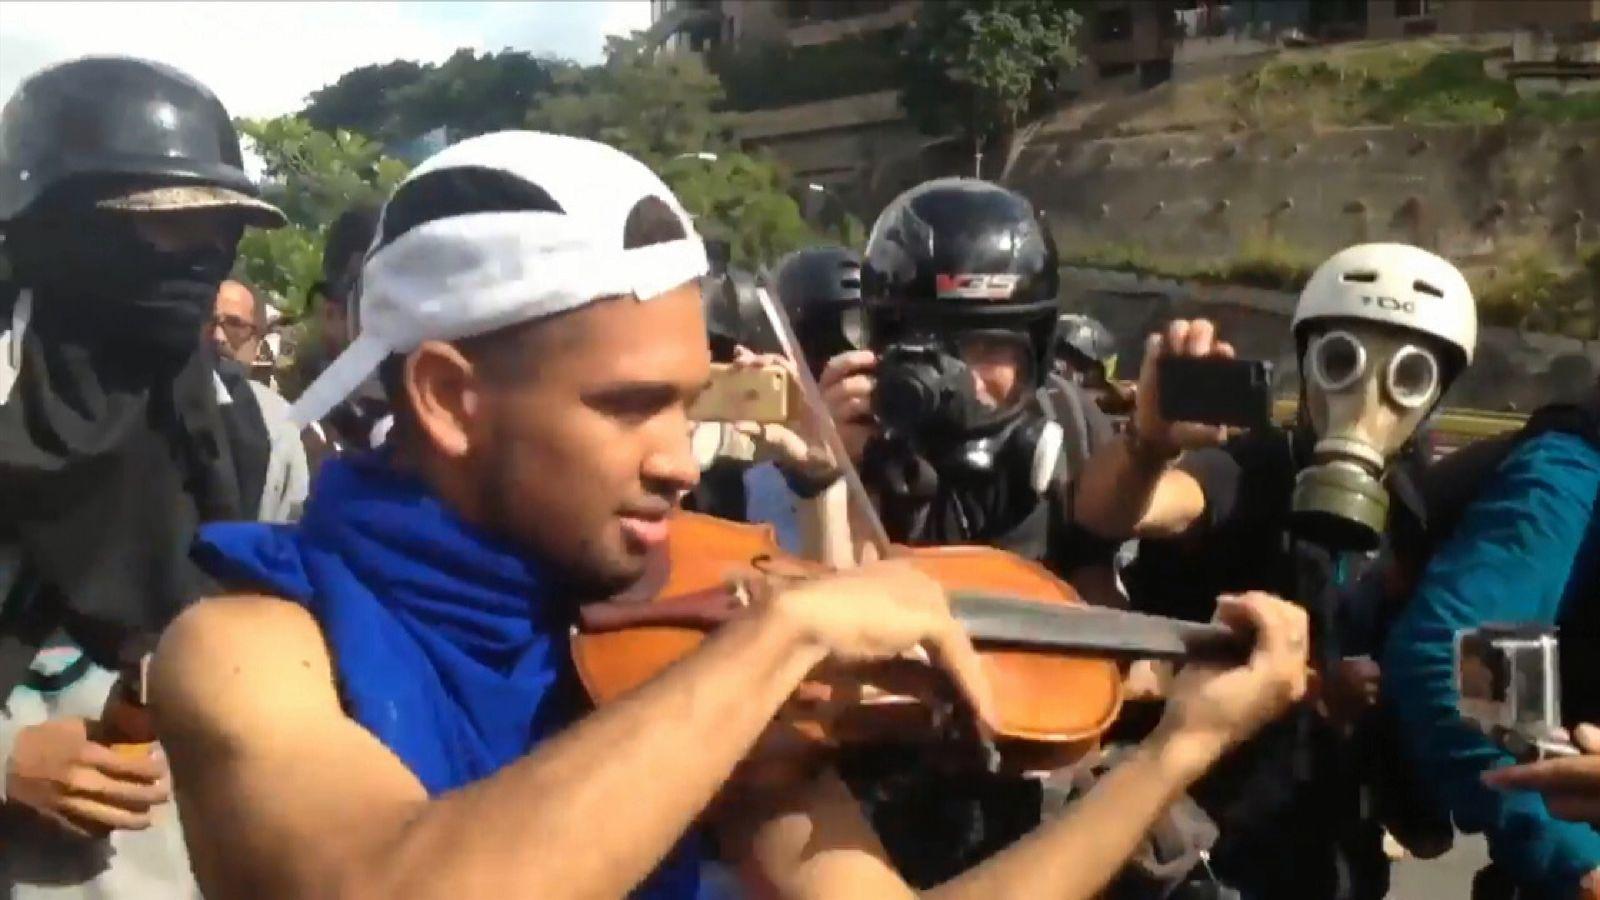 Protester plays violin amid anti-government march in Venezuela